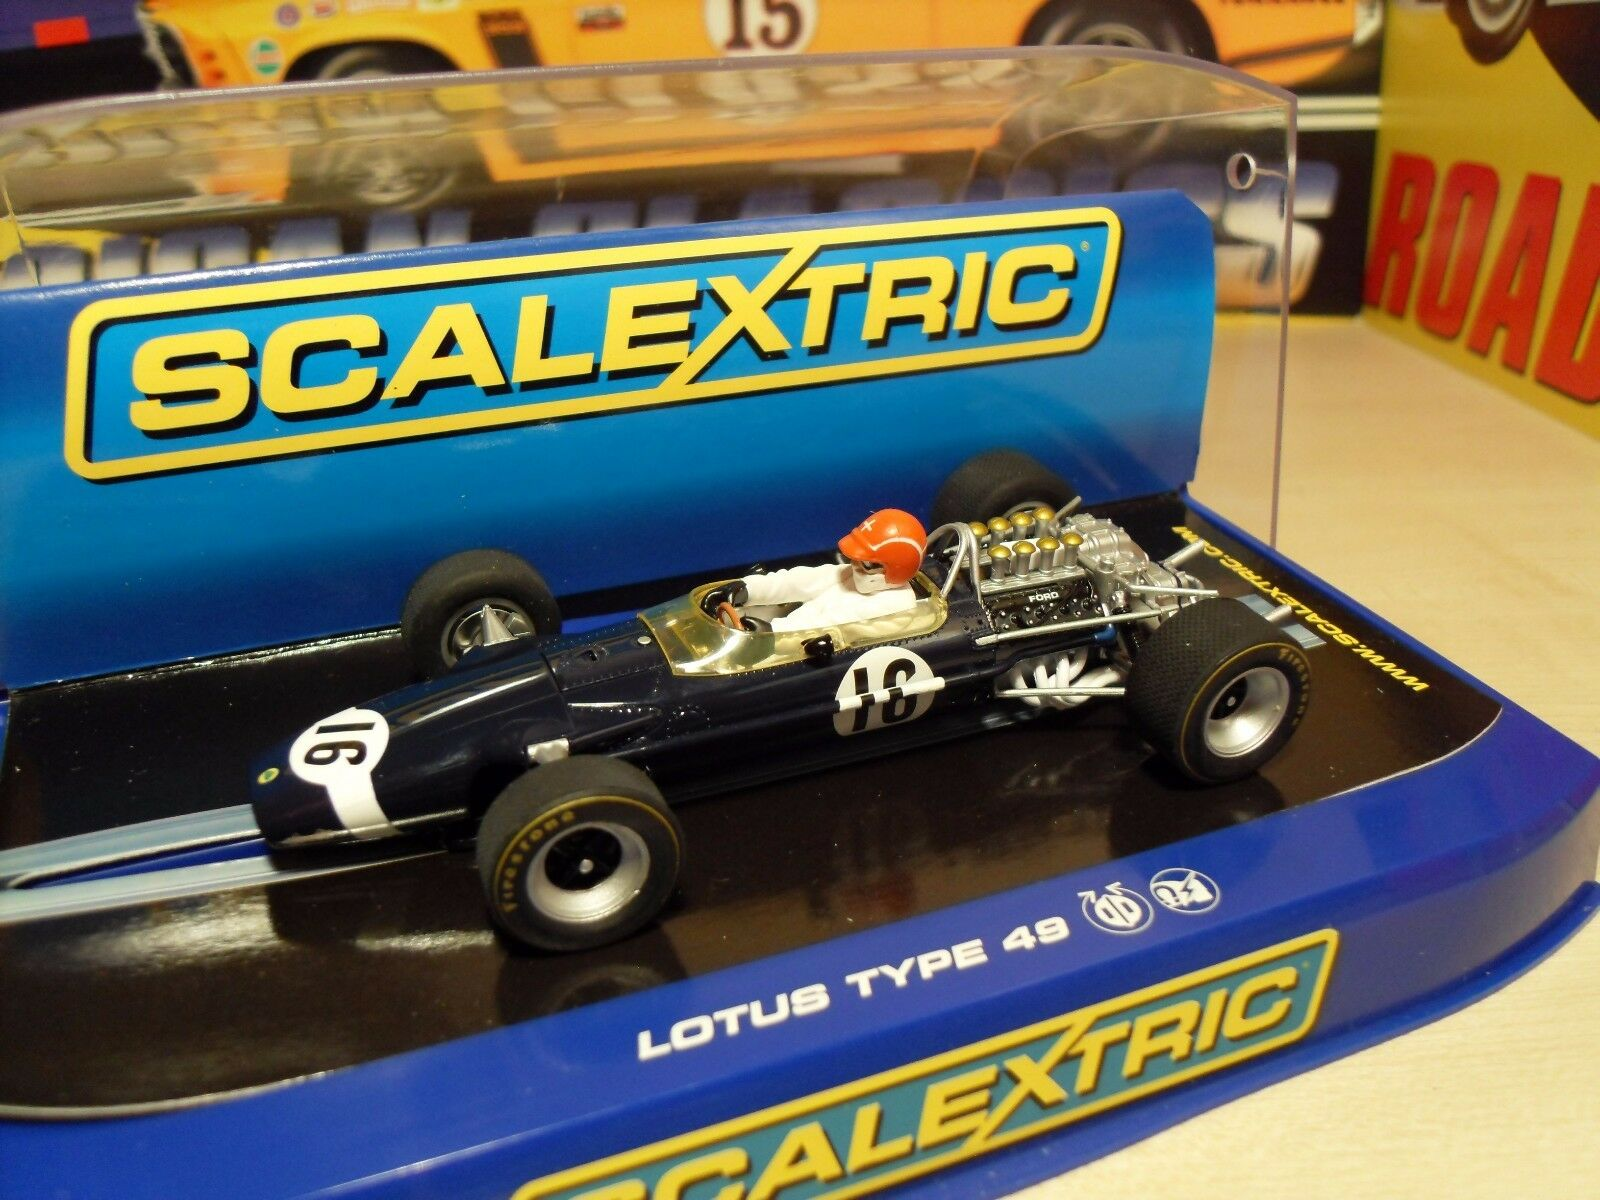 Scalextric C3092 Lotus 49 'Jo Siffert' - Brand New in Box.